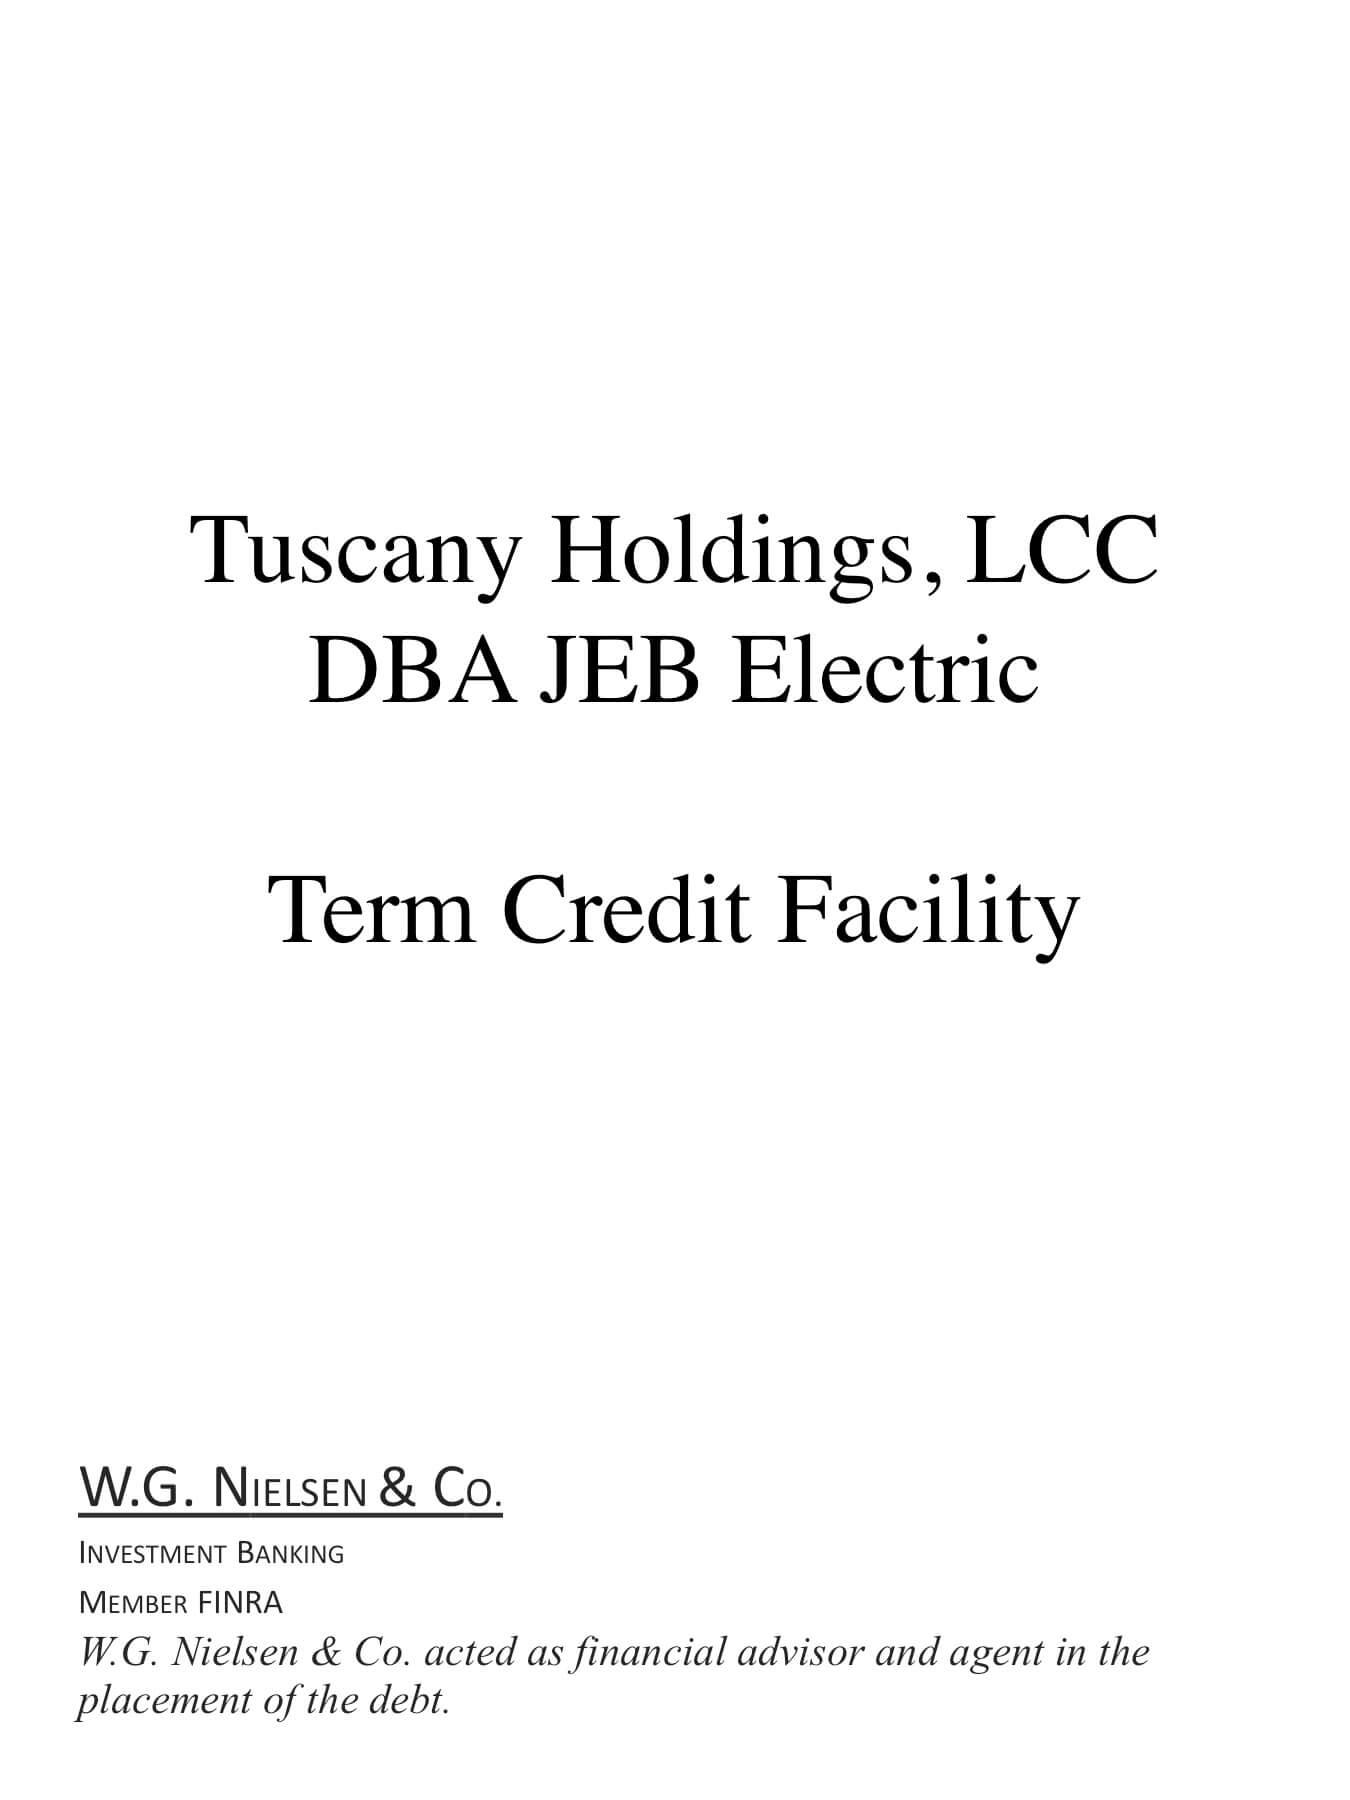 tuscany holdings investment banking transaction